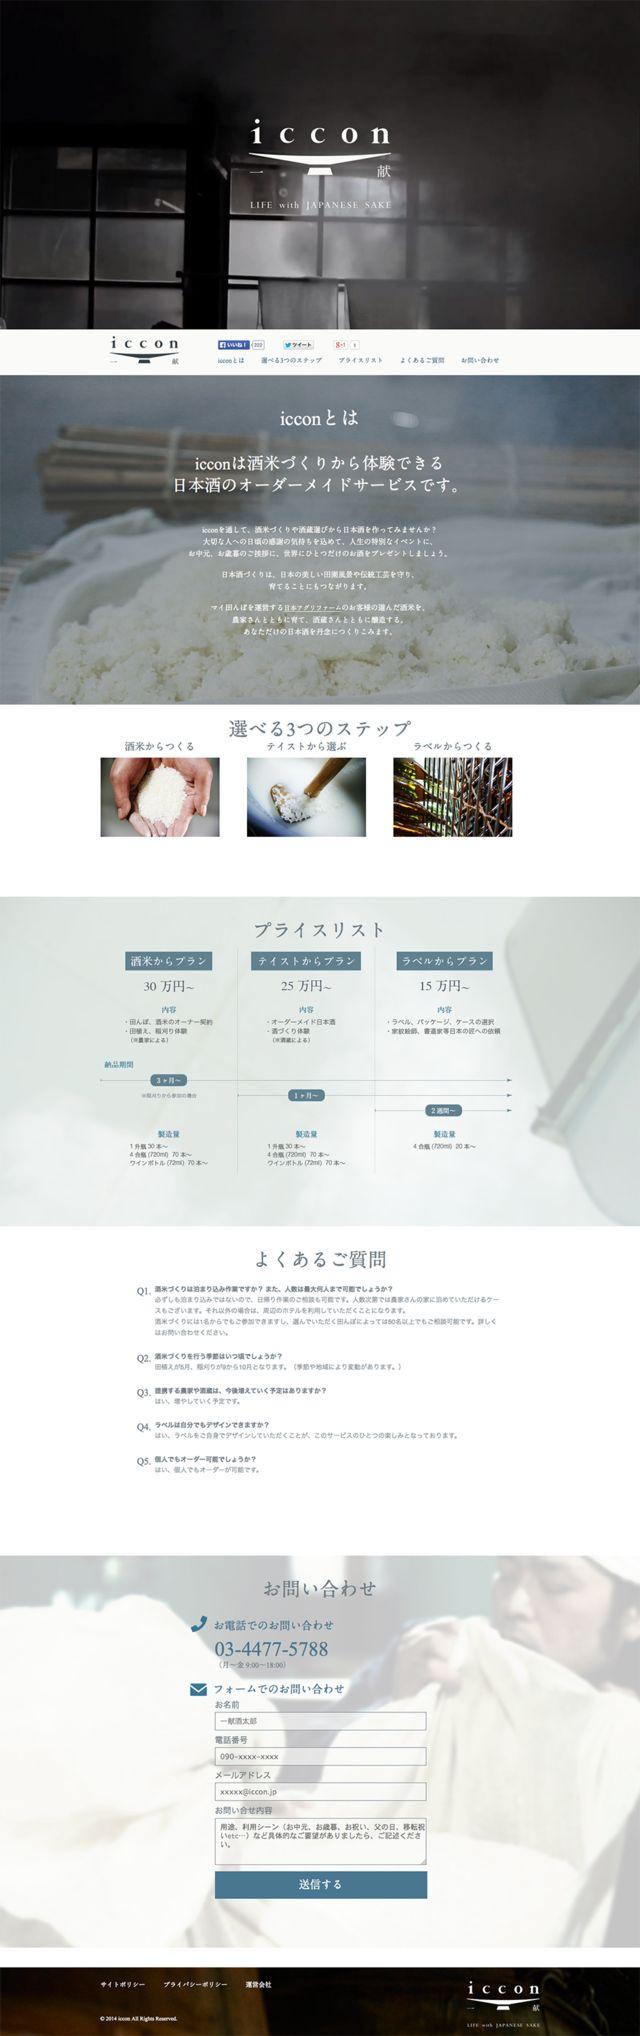 Iccon/一献 日本酒のオーダーメイドサービス - chiiiiiharu